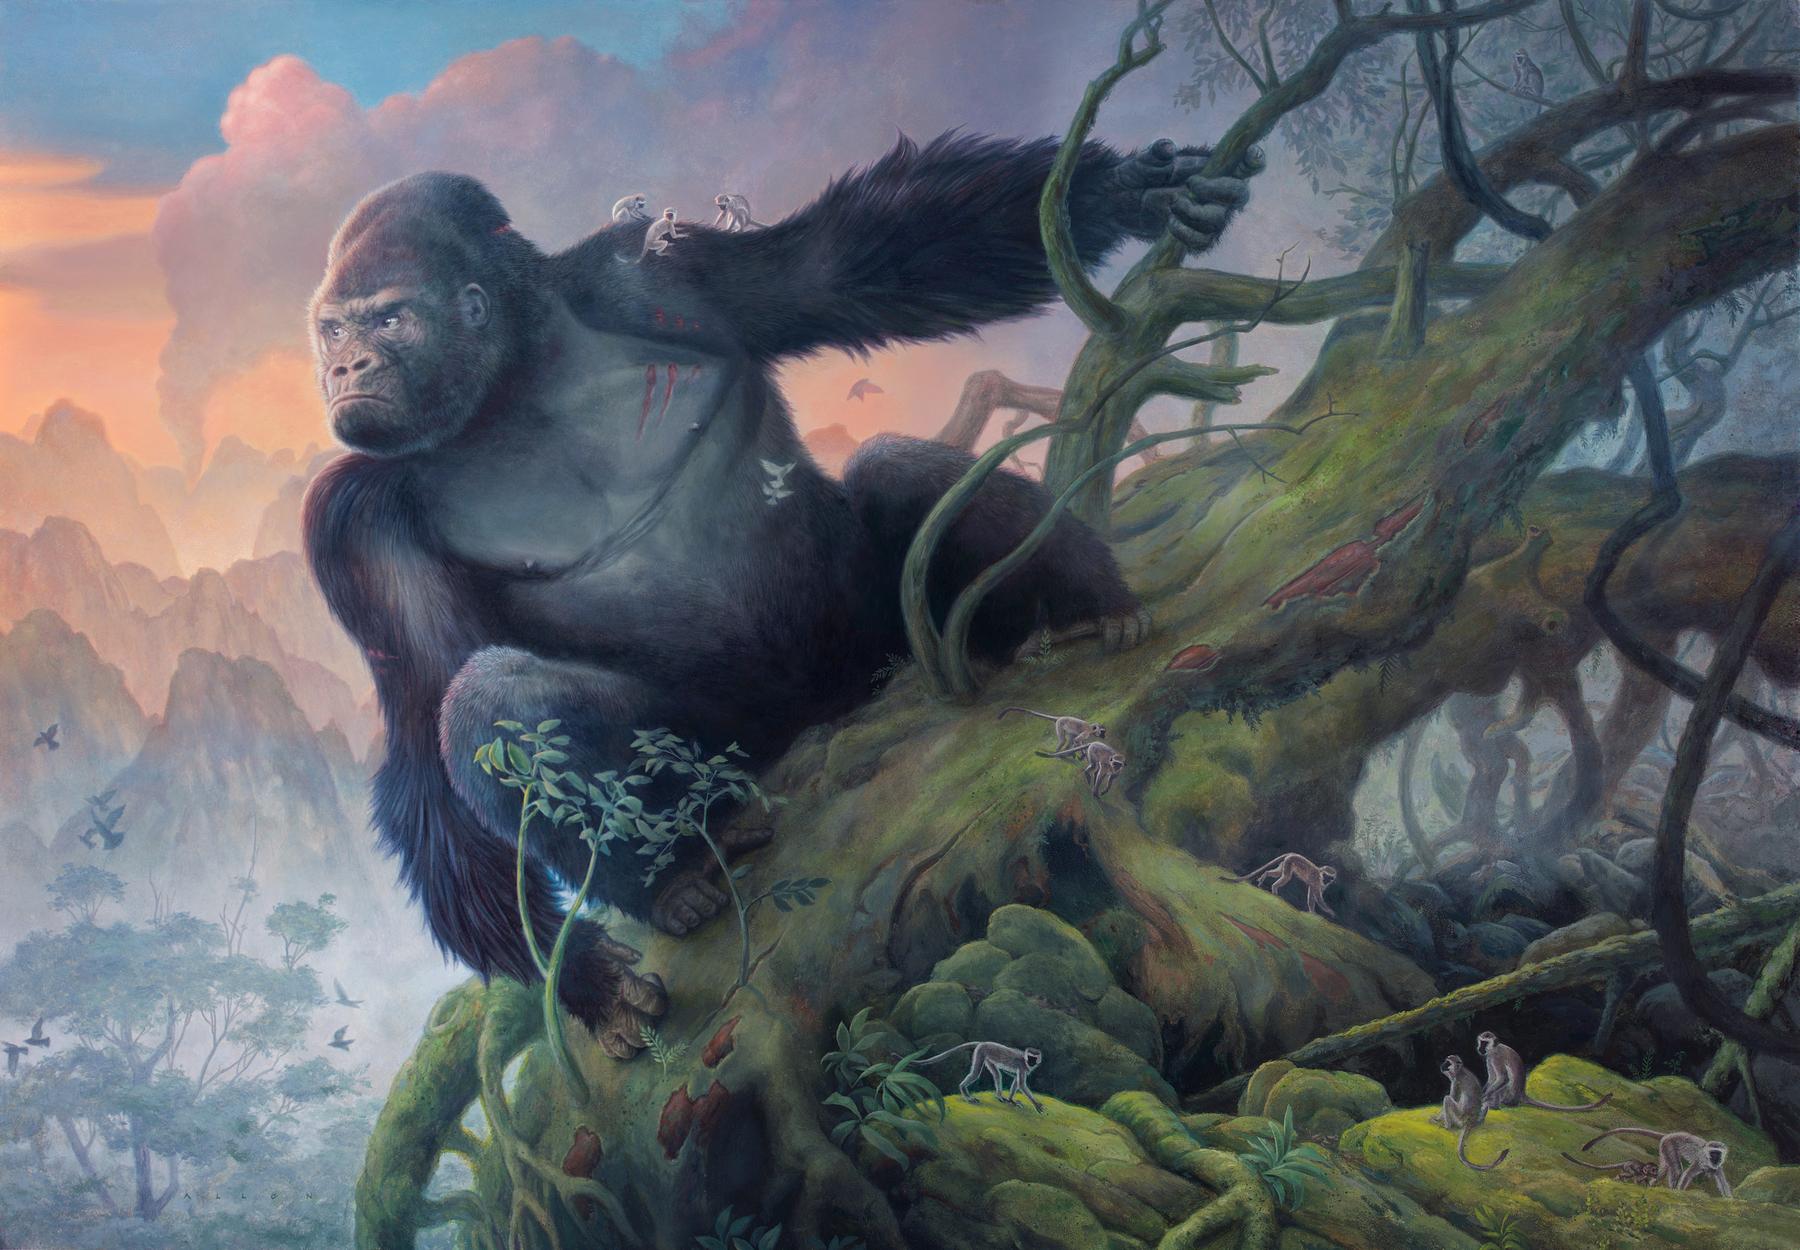 Kong Artwork by Allen Douglas